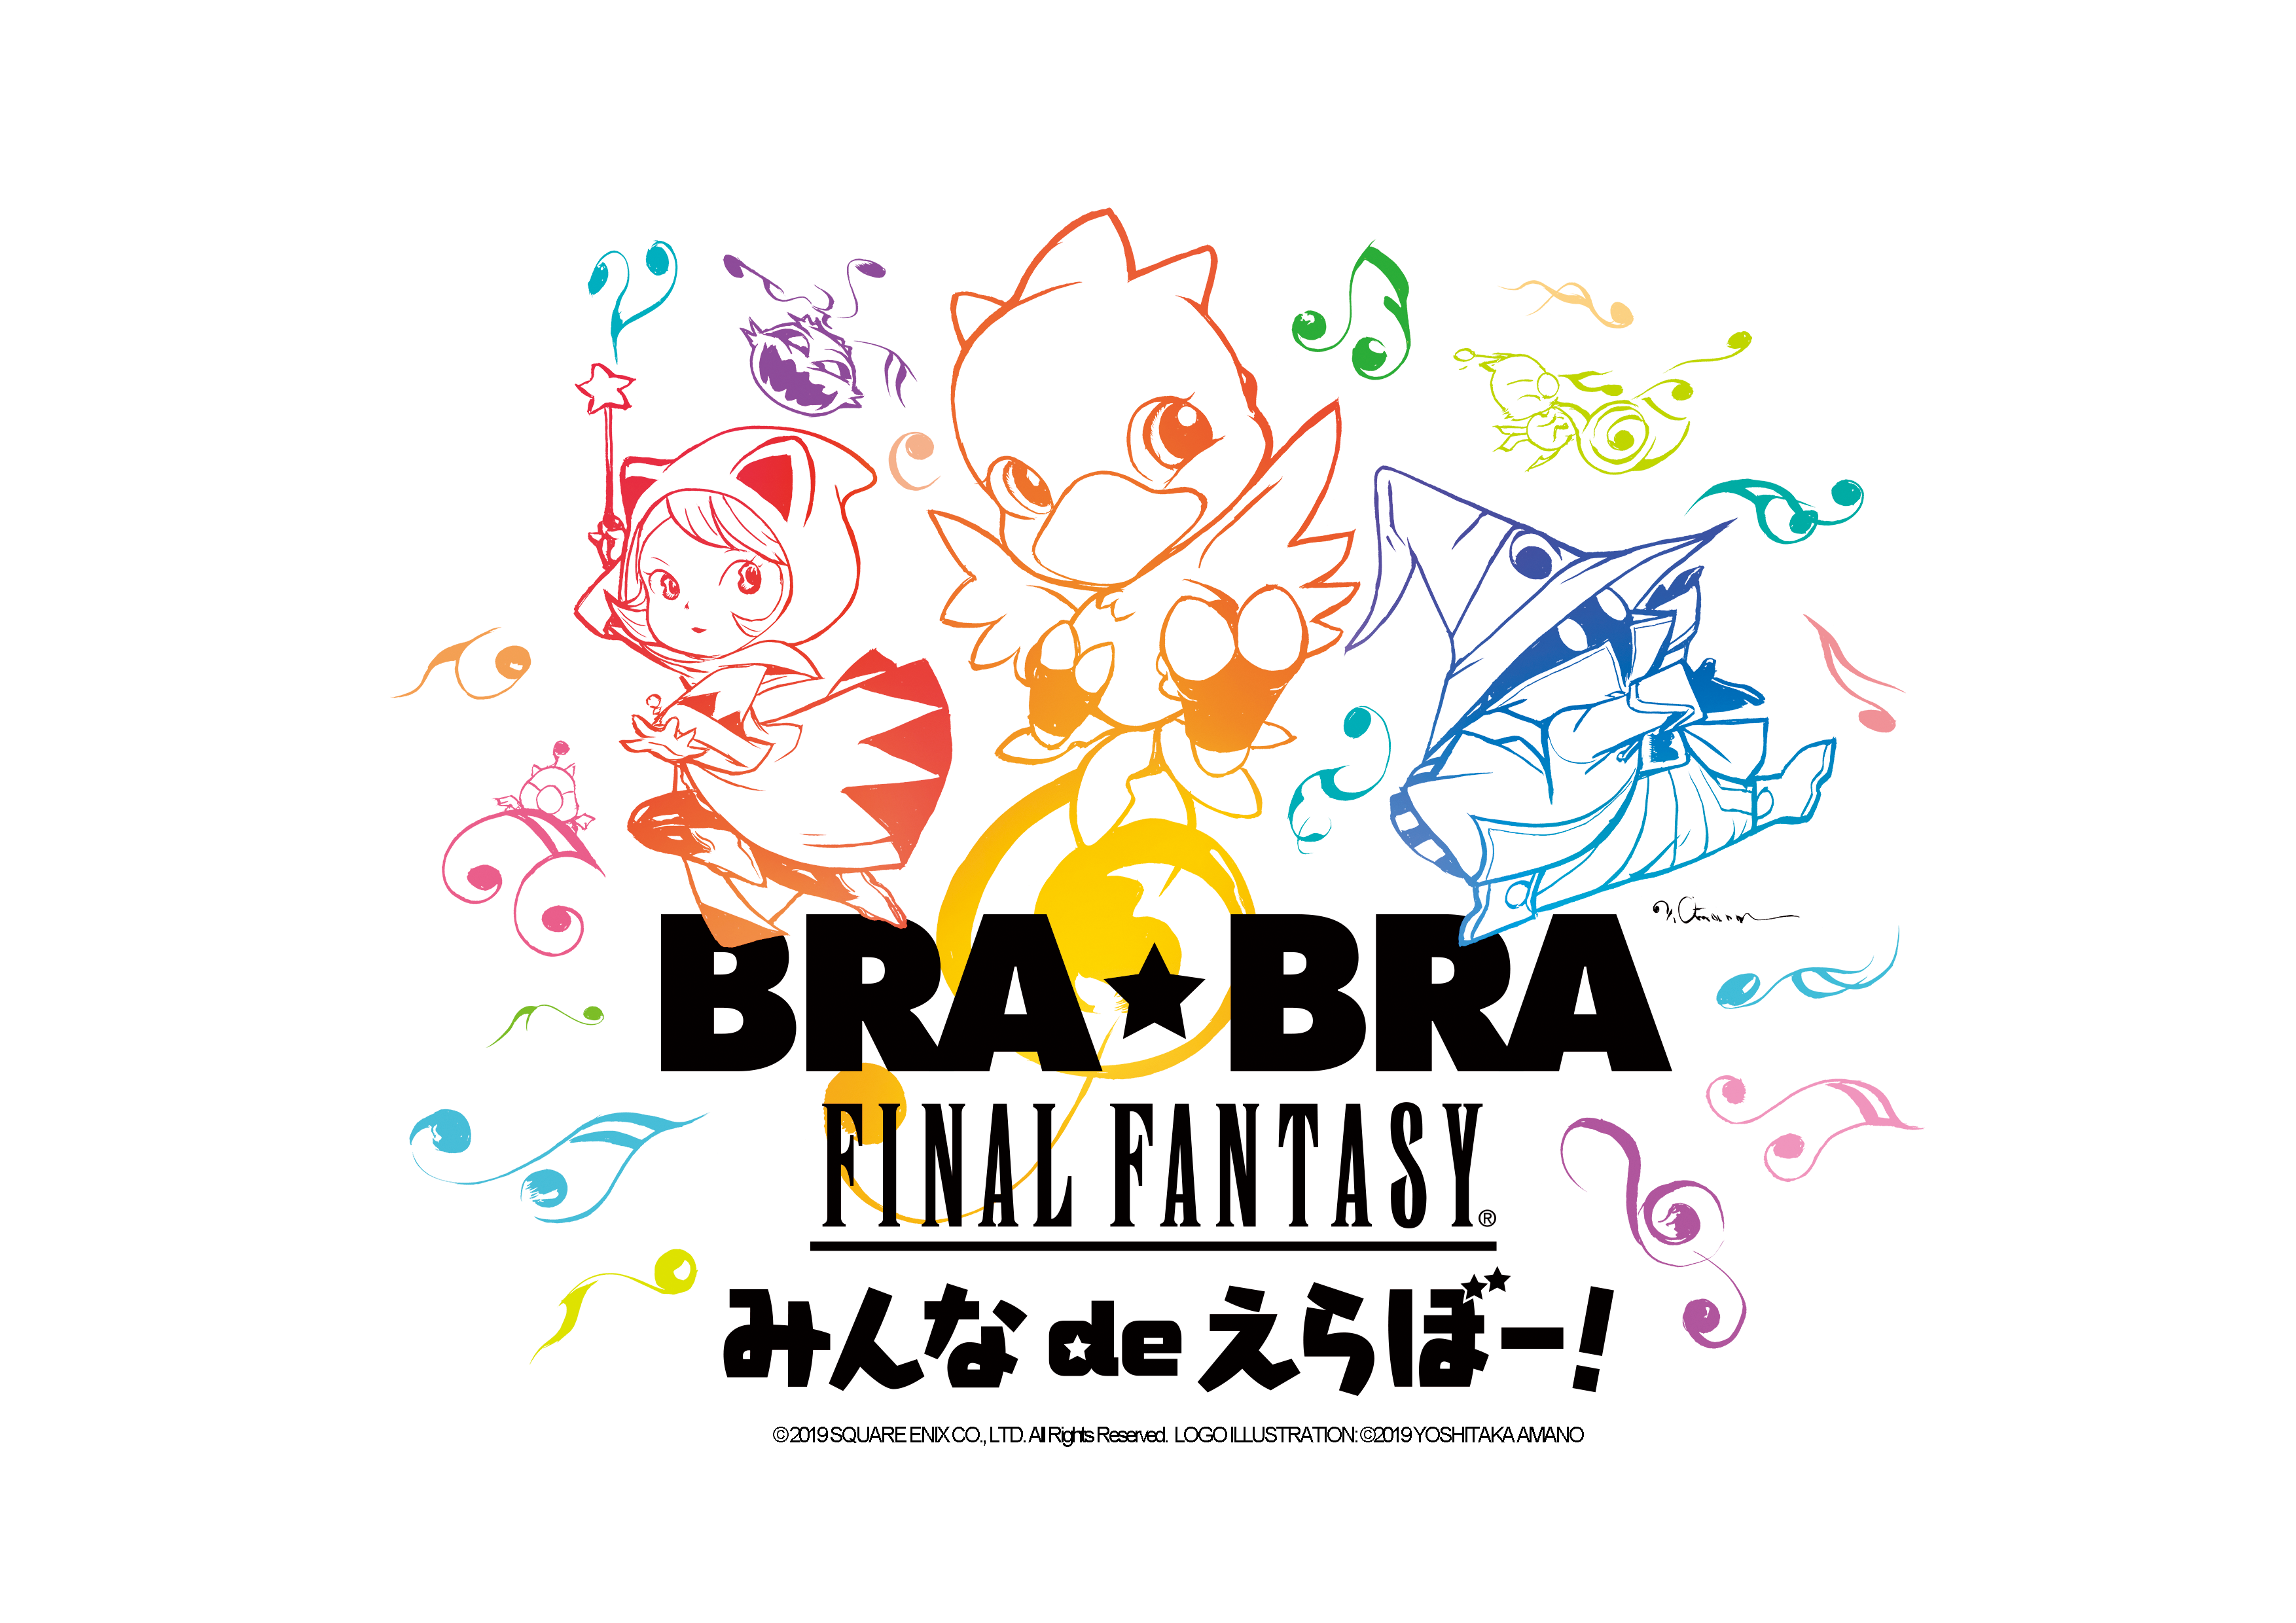 繧ウ繝偵z繝シ繝ゥ繧、繝・BRABRA2019_logo_RGB_fix